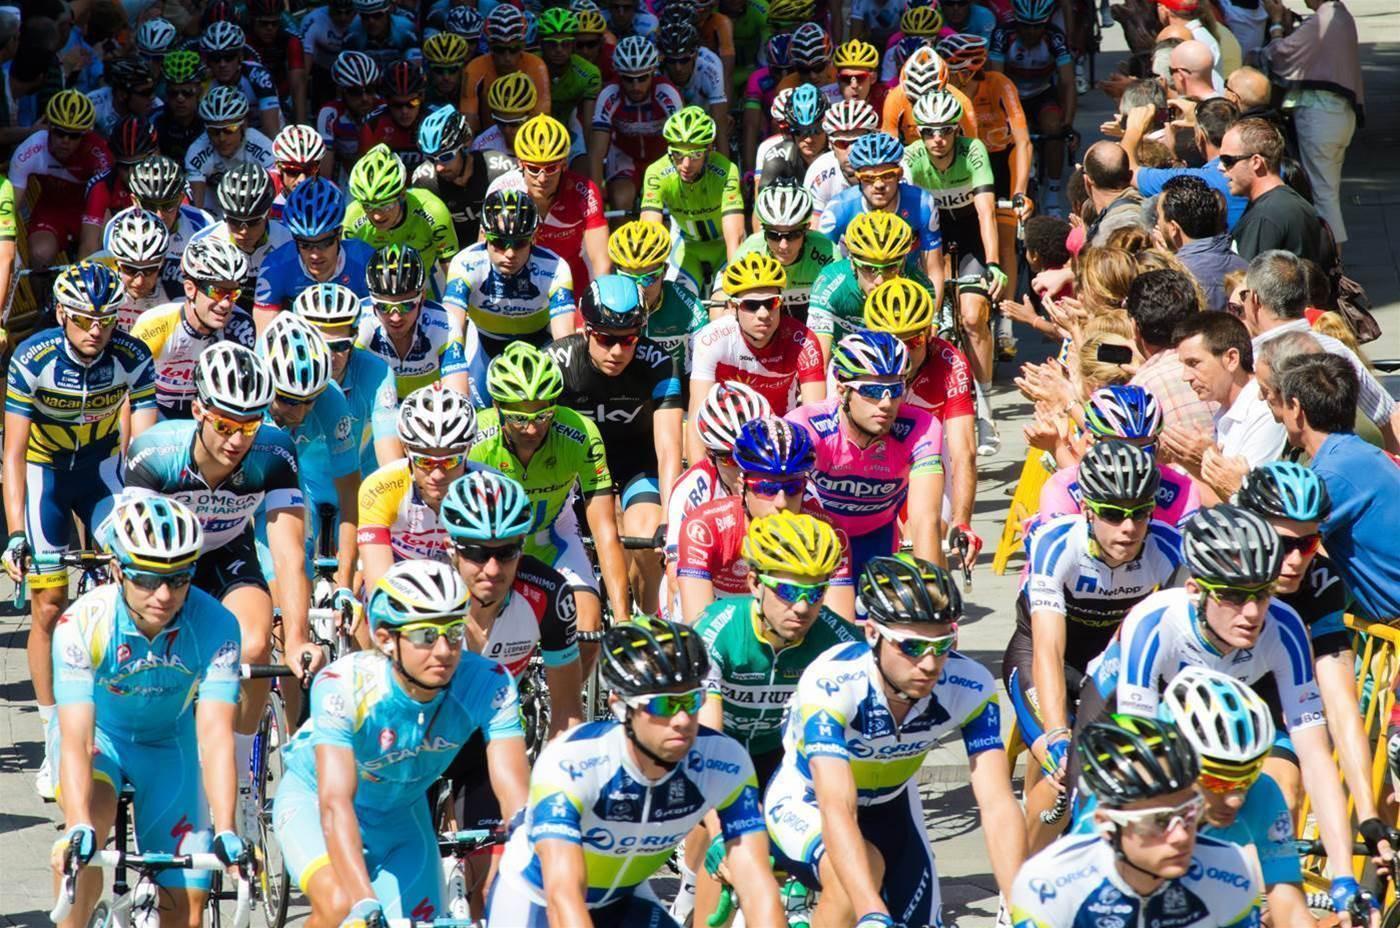 Vuelta a Espana preview